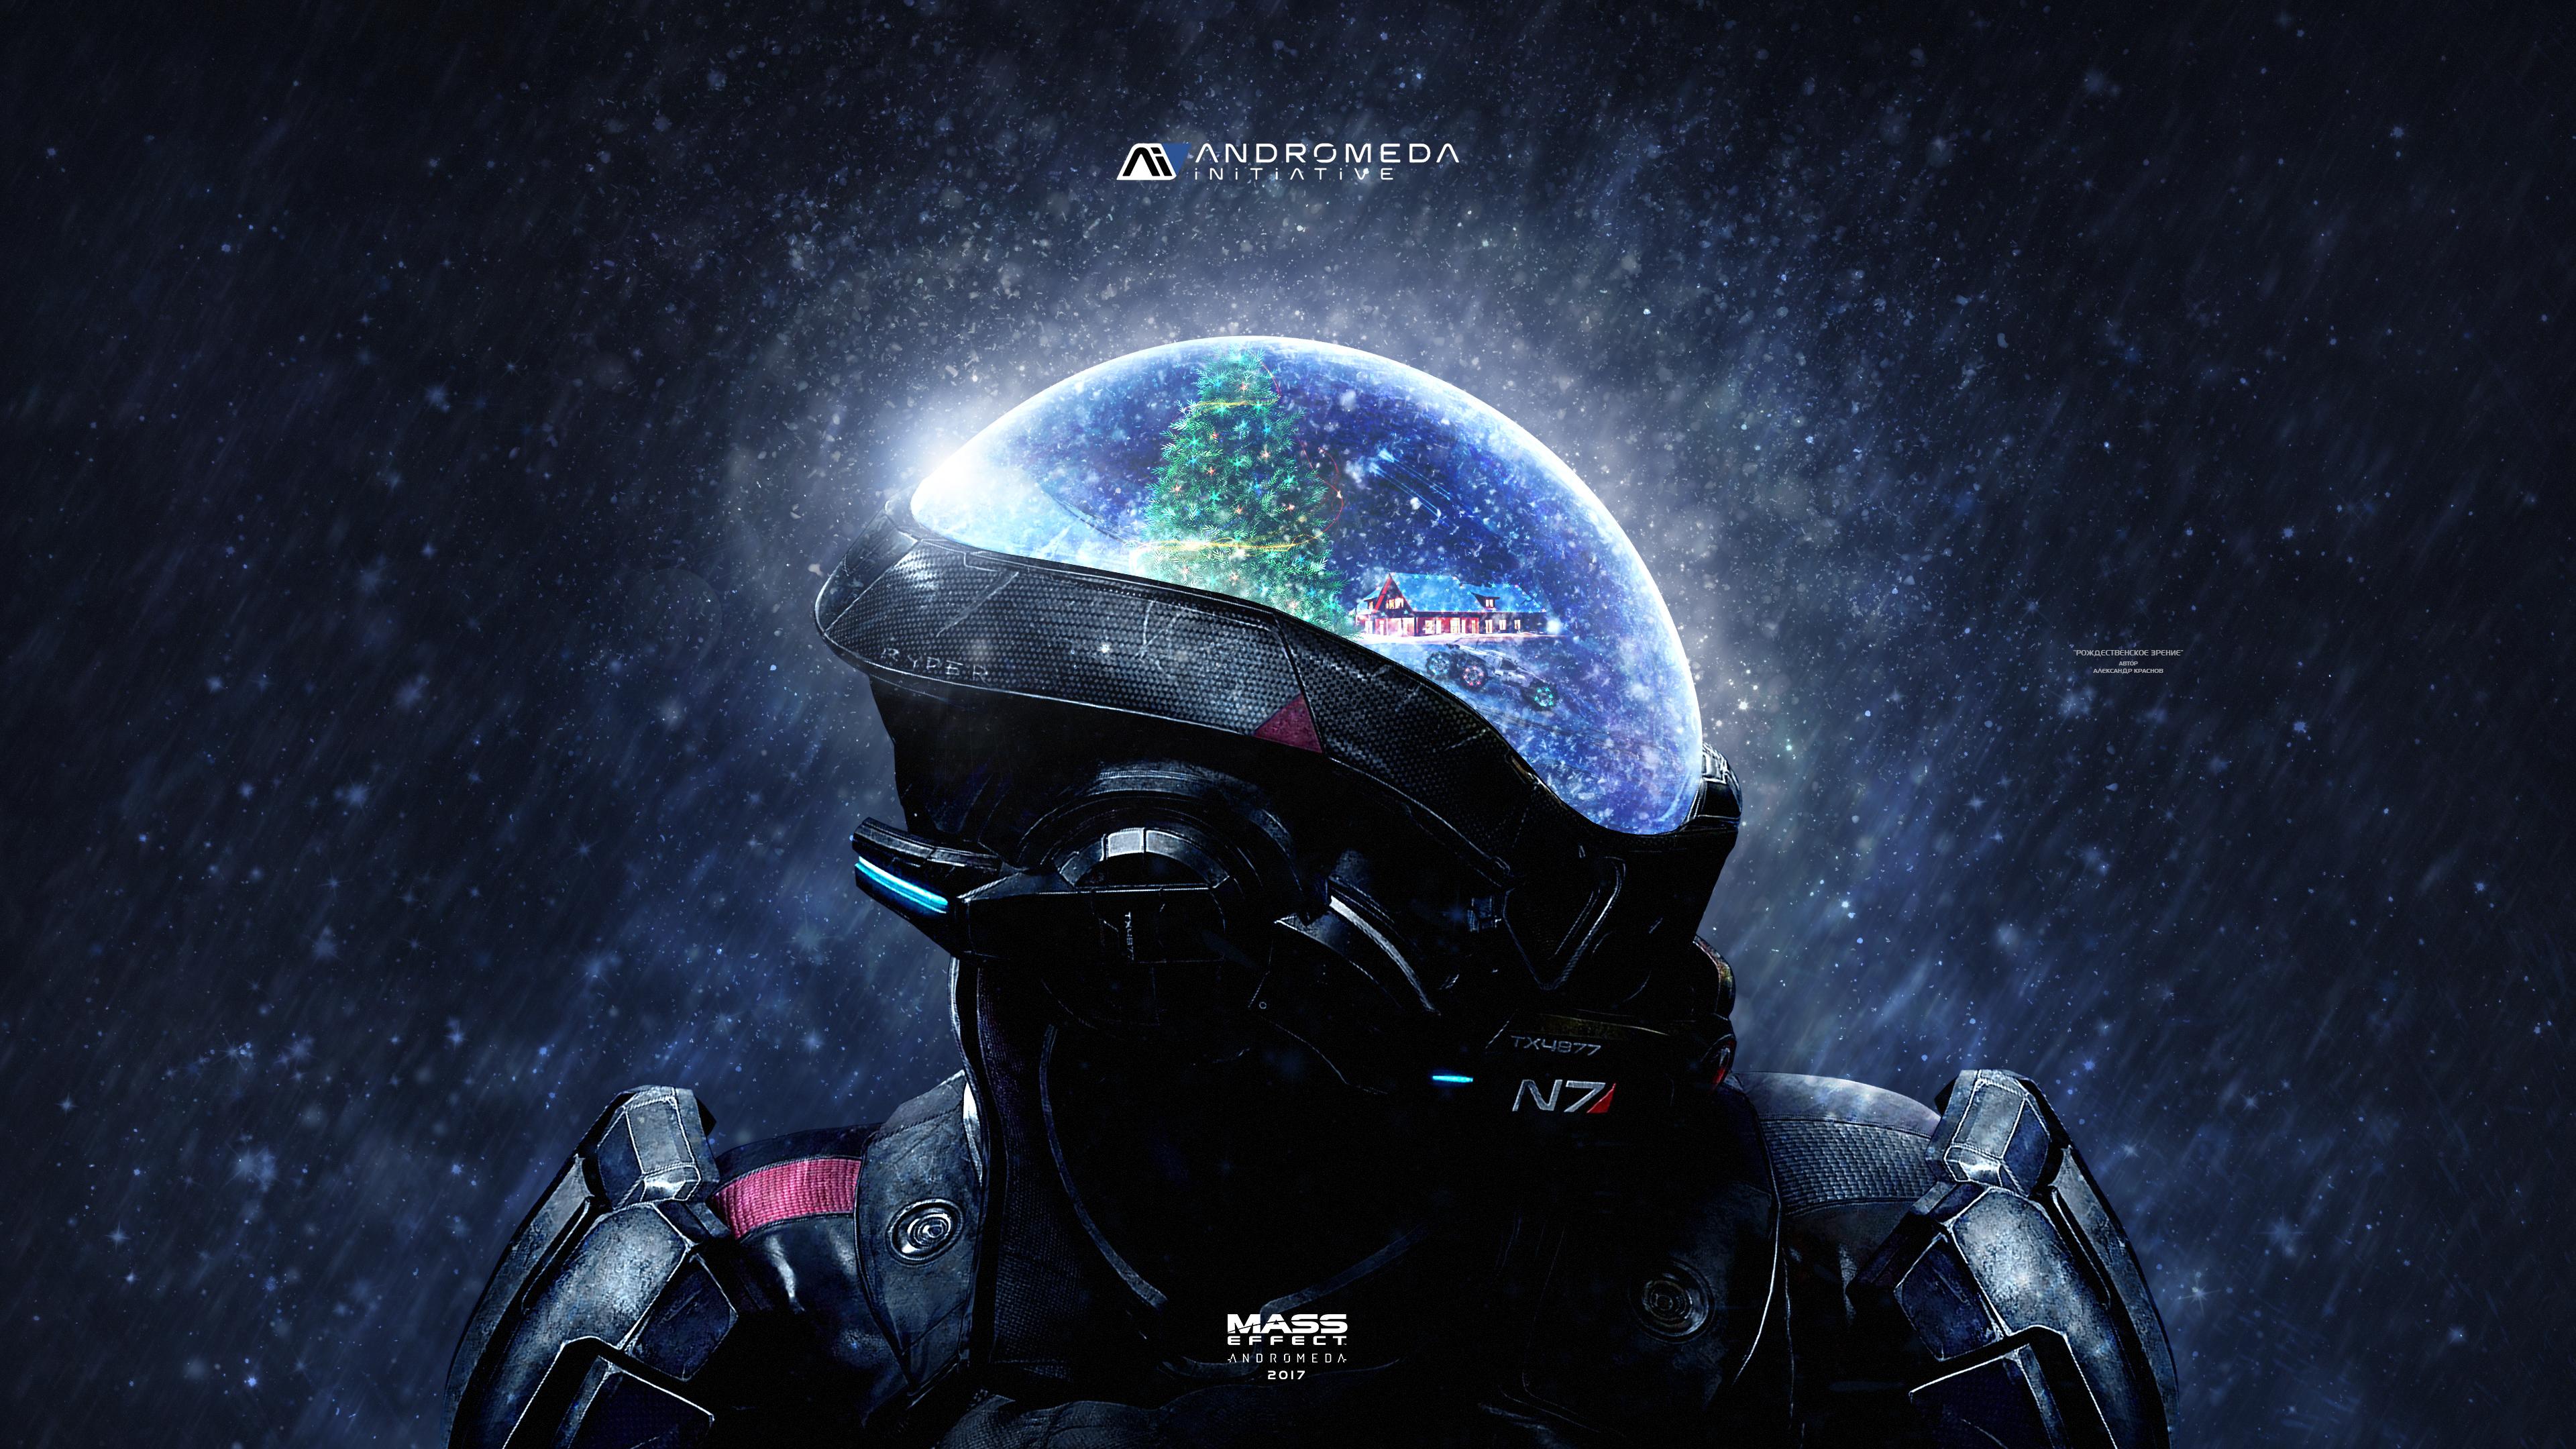 Mass Effect Andromeda Christmas 4k Hd Games 4k Wallpapers